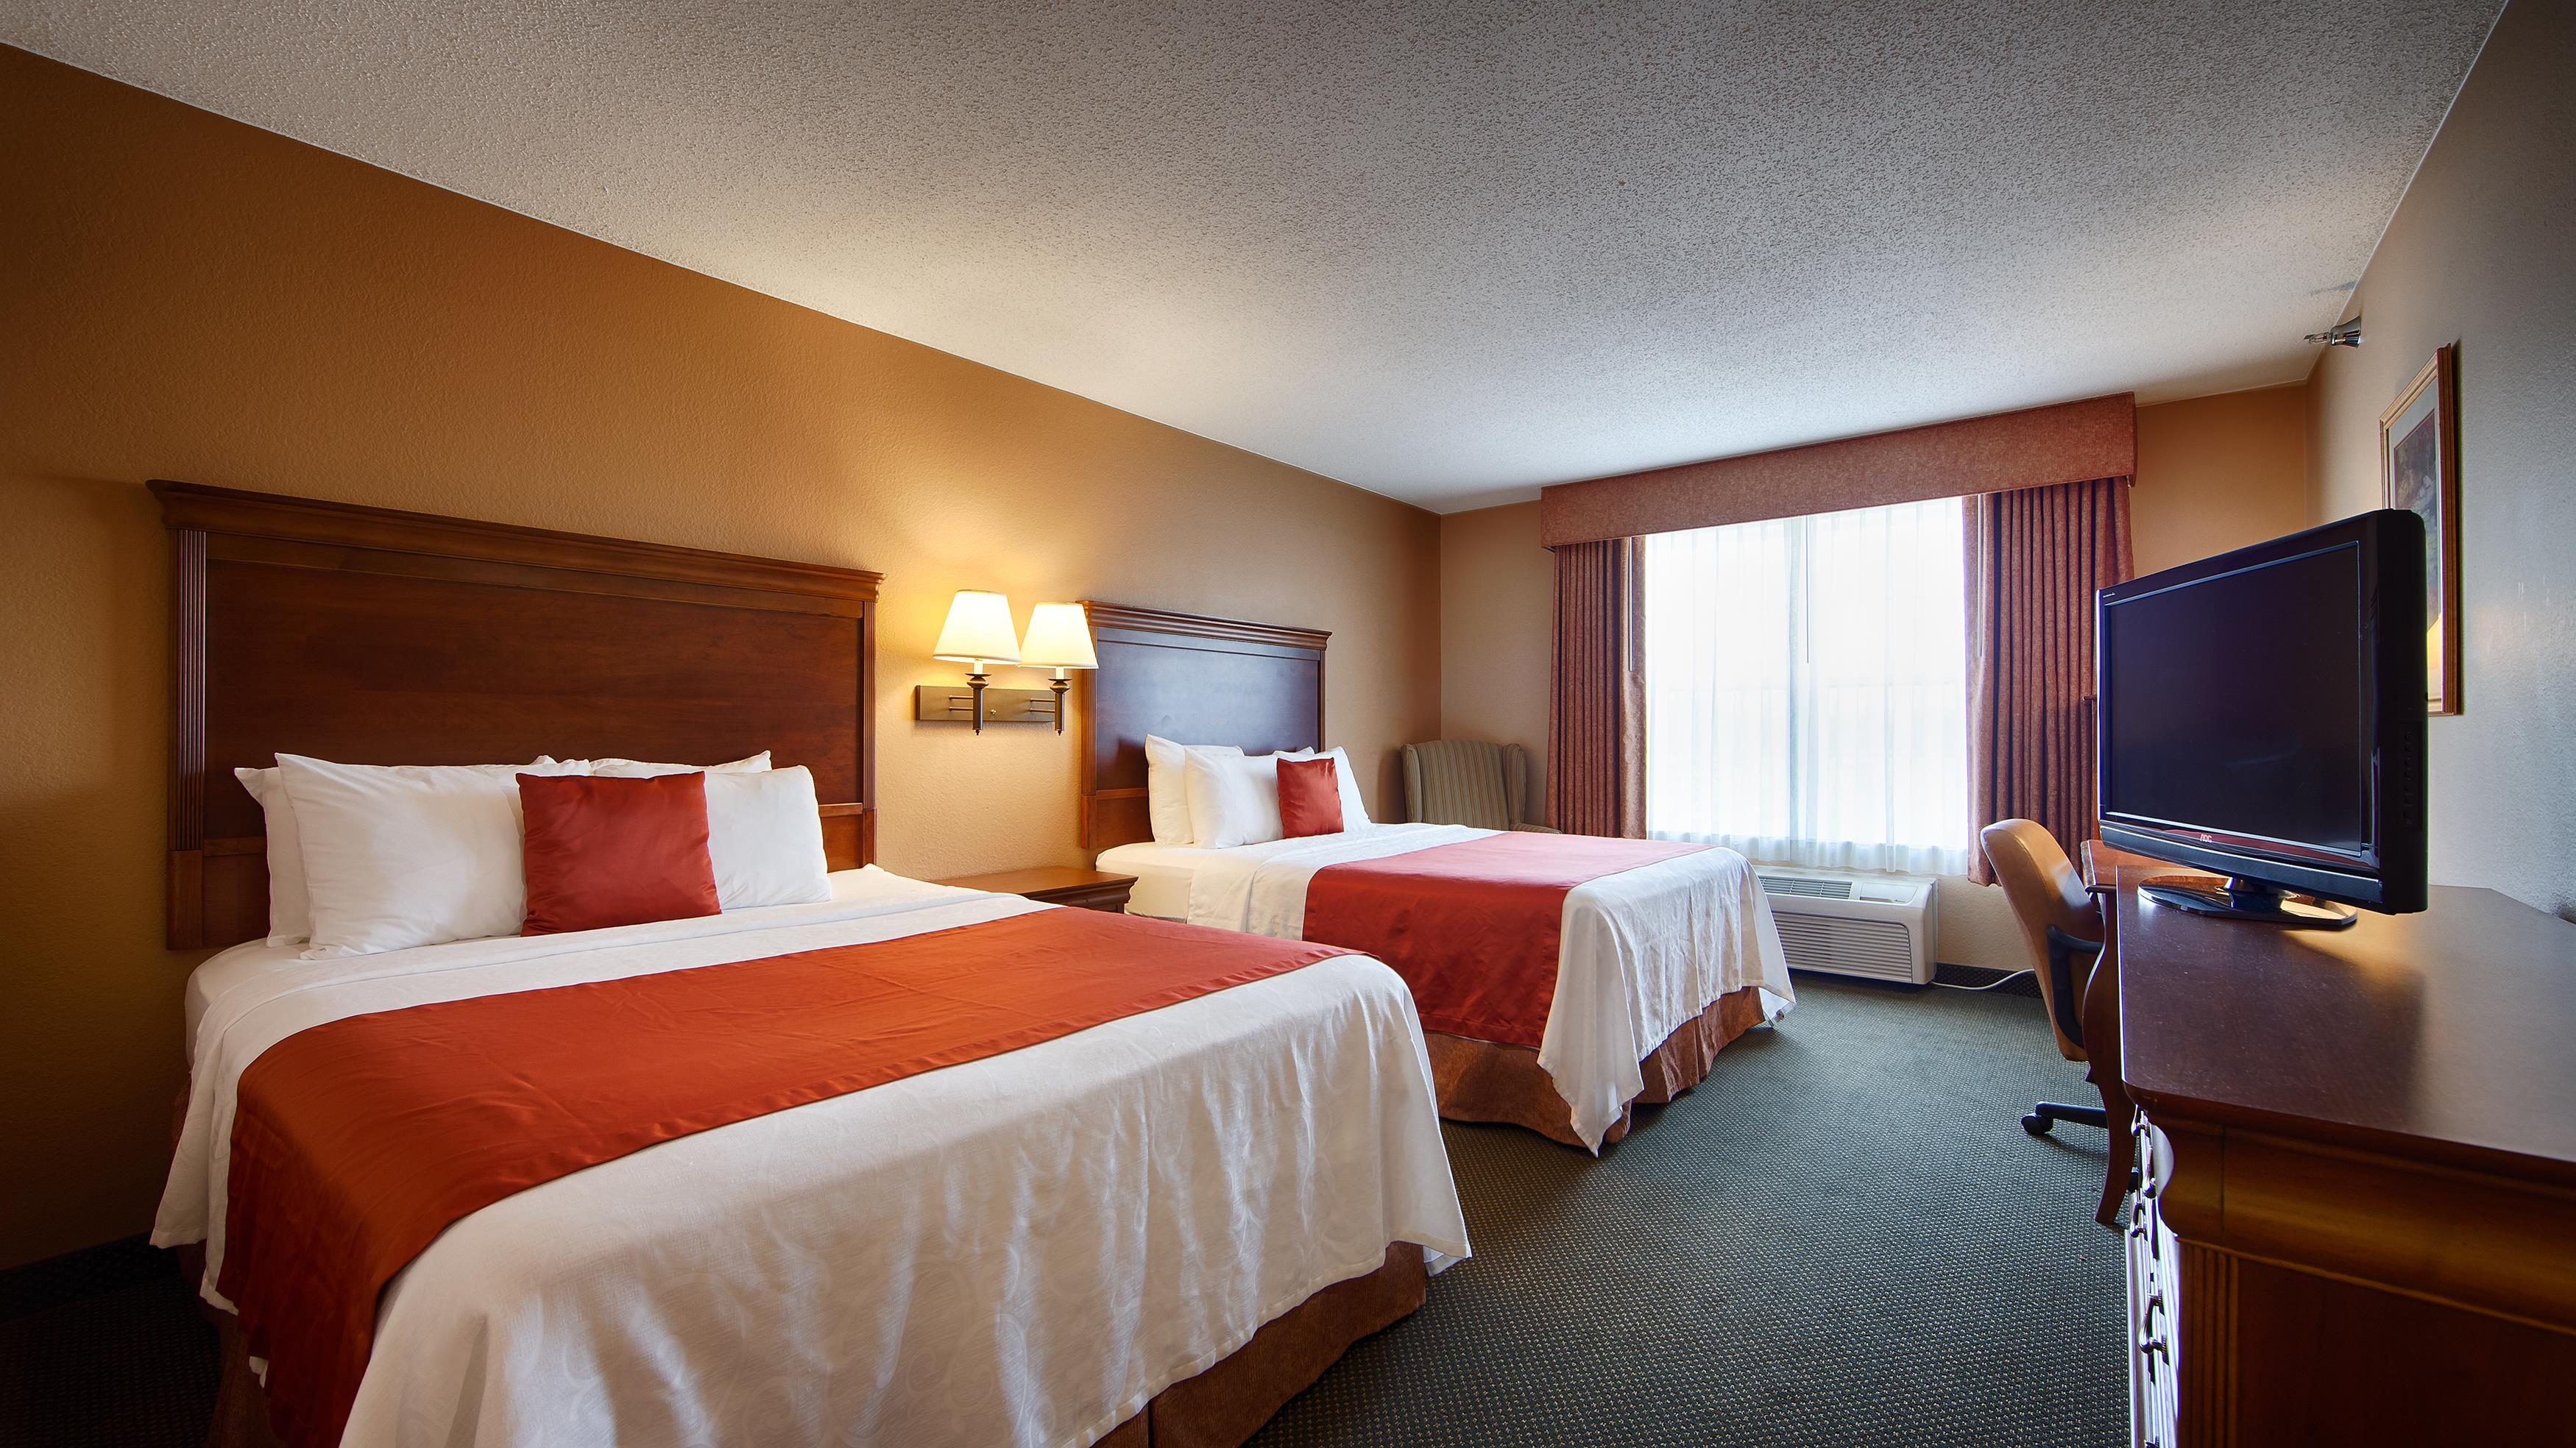 Best Western Plus Independence Inn & Suites, Independence IA